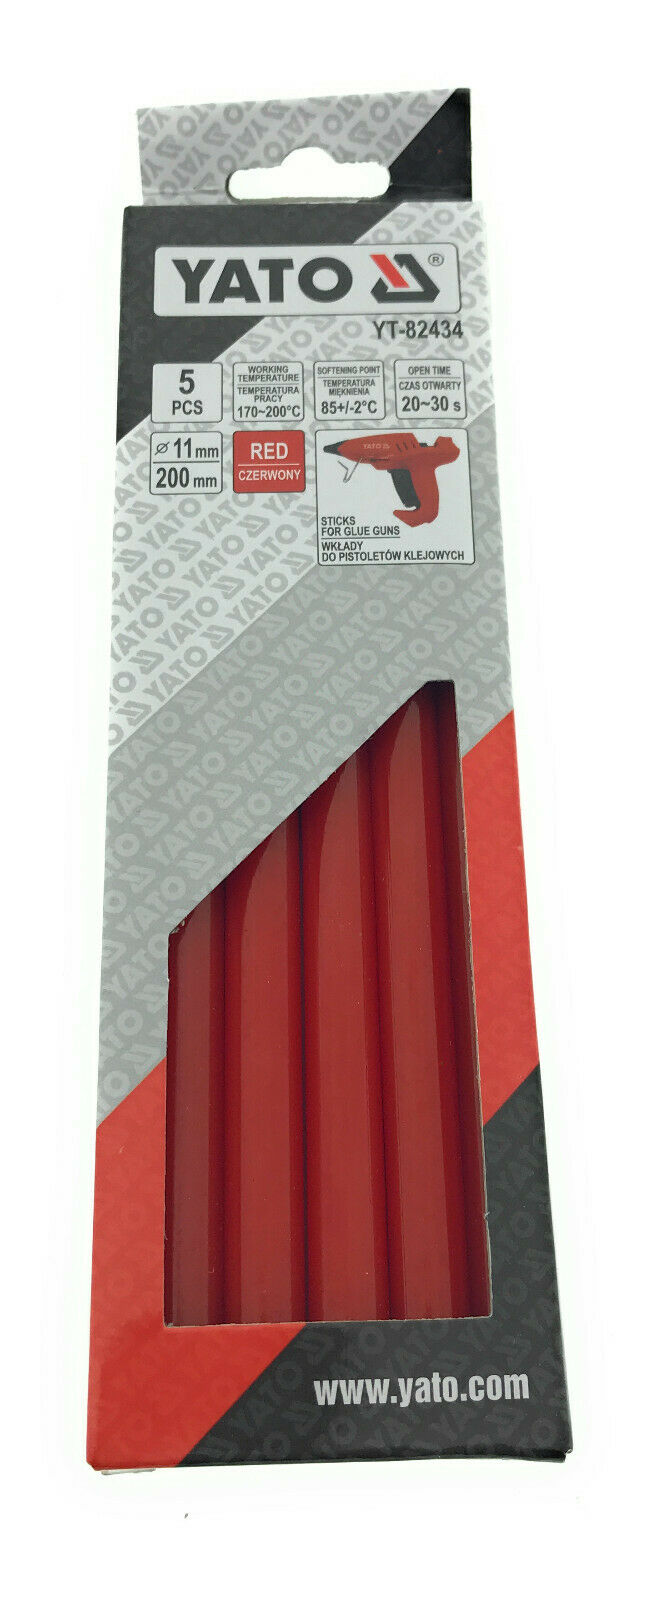 Heißklebesticks Heißklebepatronen Sticks Heißklebepistole Klebestifte 11mm Rot